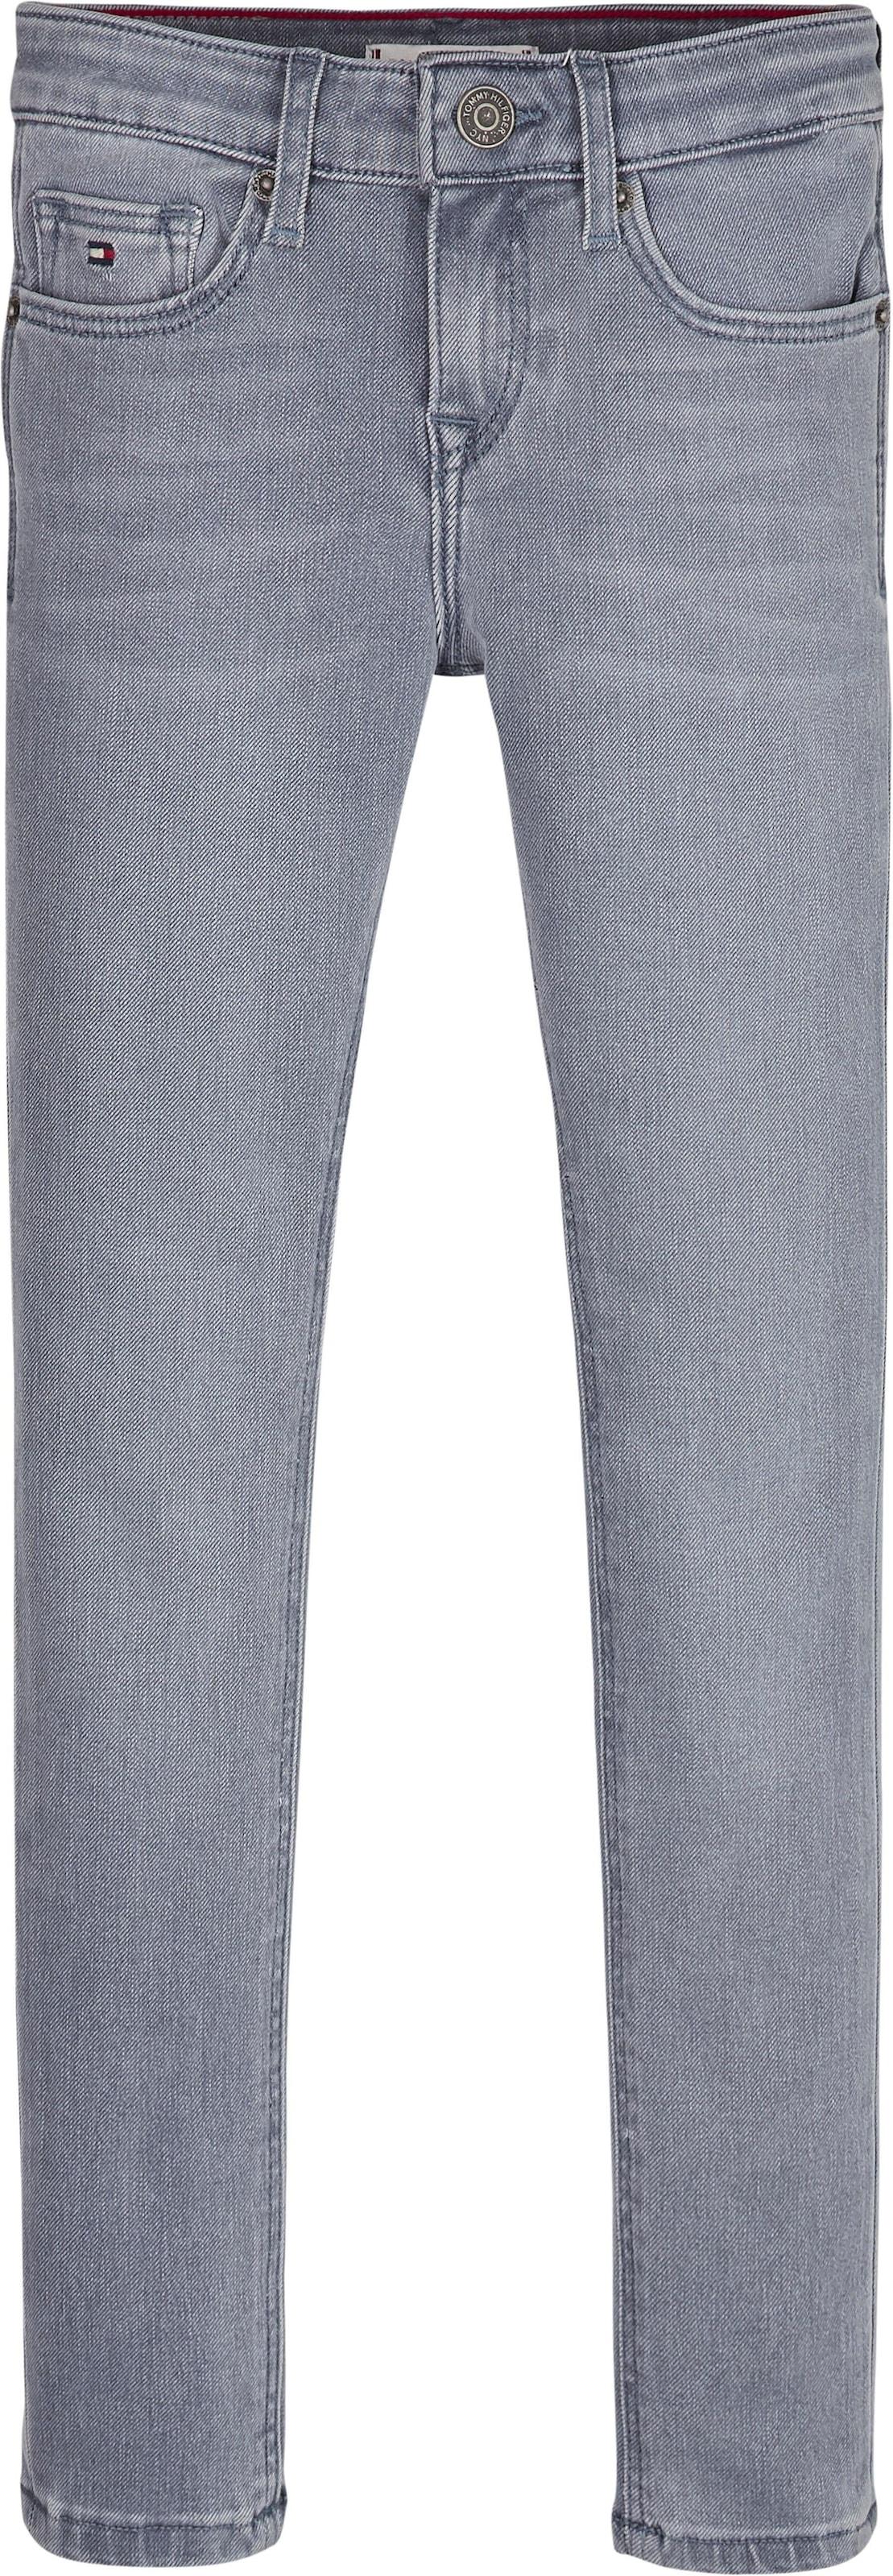 Tommy Hilfiger M/ädchen Nora Rr Skinny Codnc Jeans